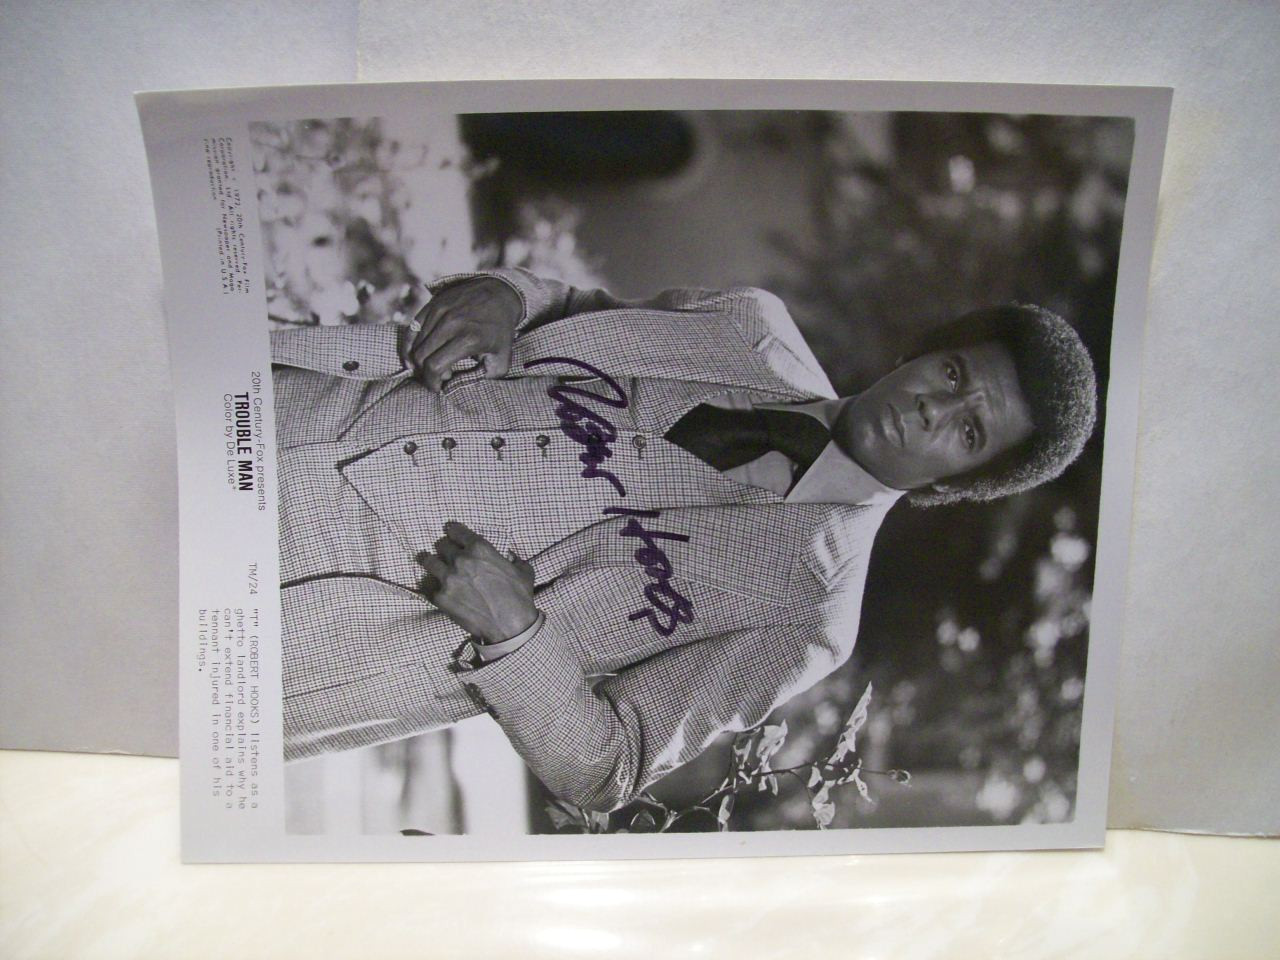 Hooks, Robert Photo Signed Autograph Trouble Man